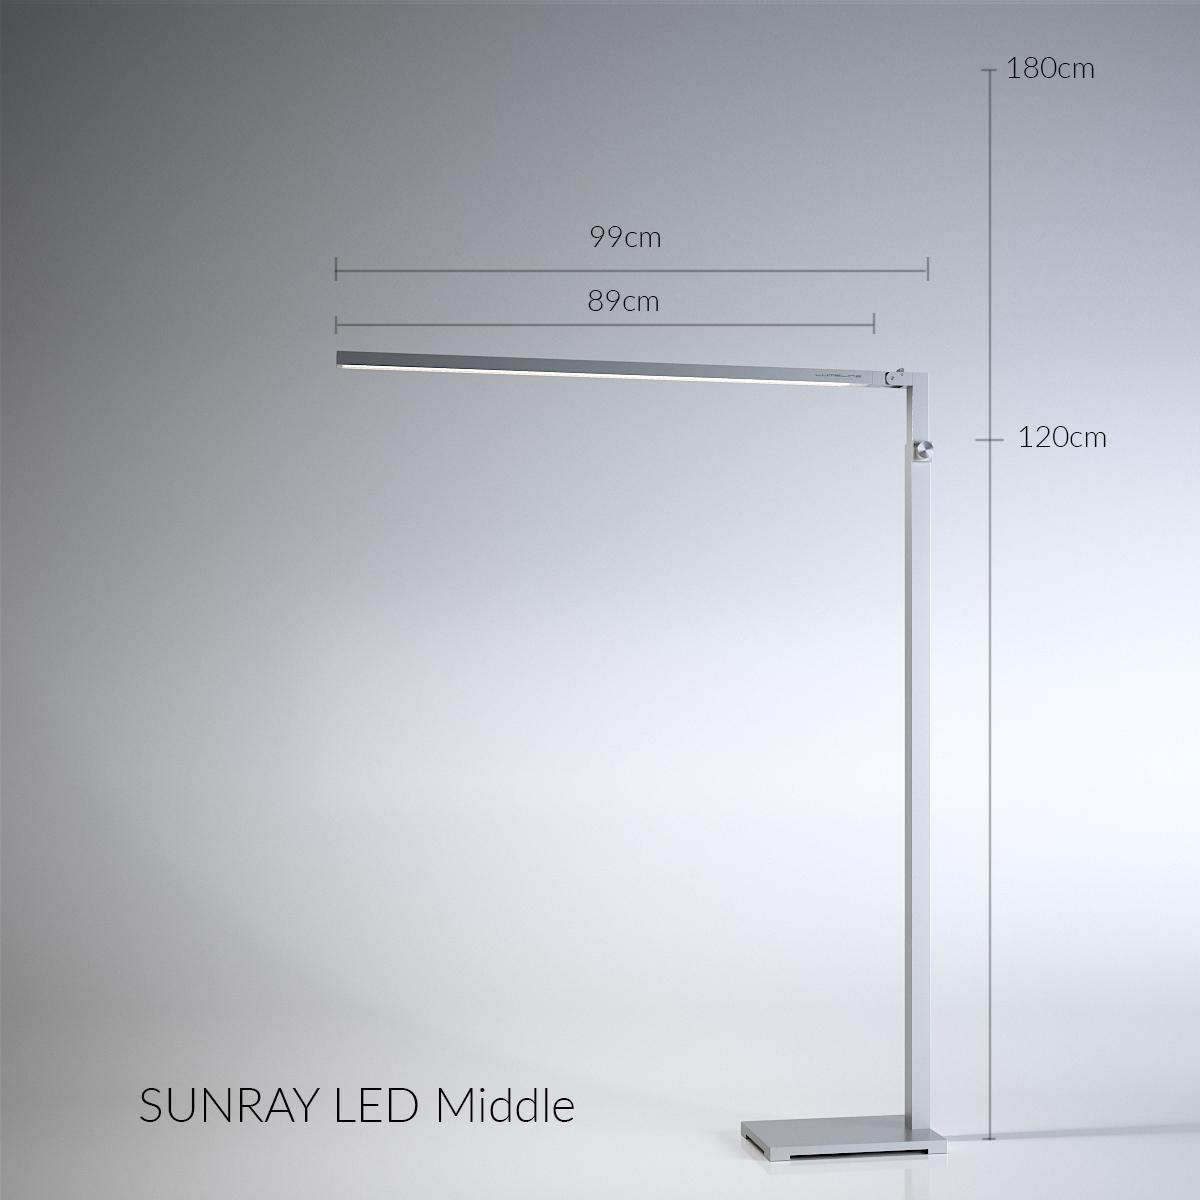 LED_silver_M_dimension